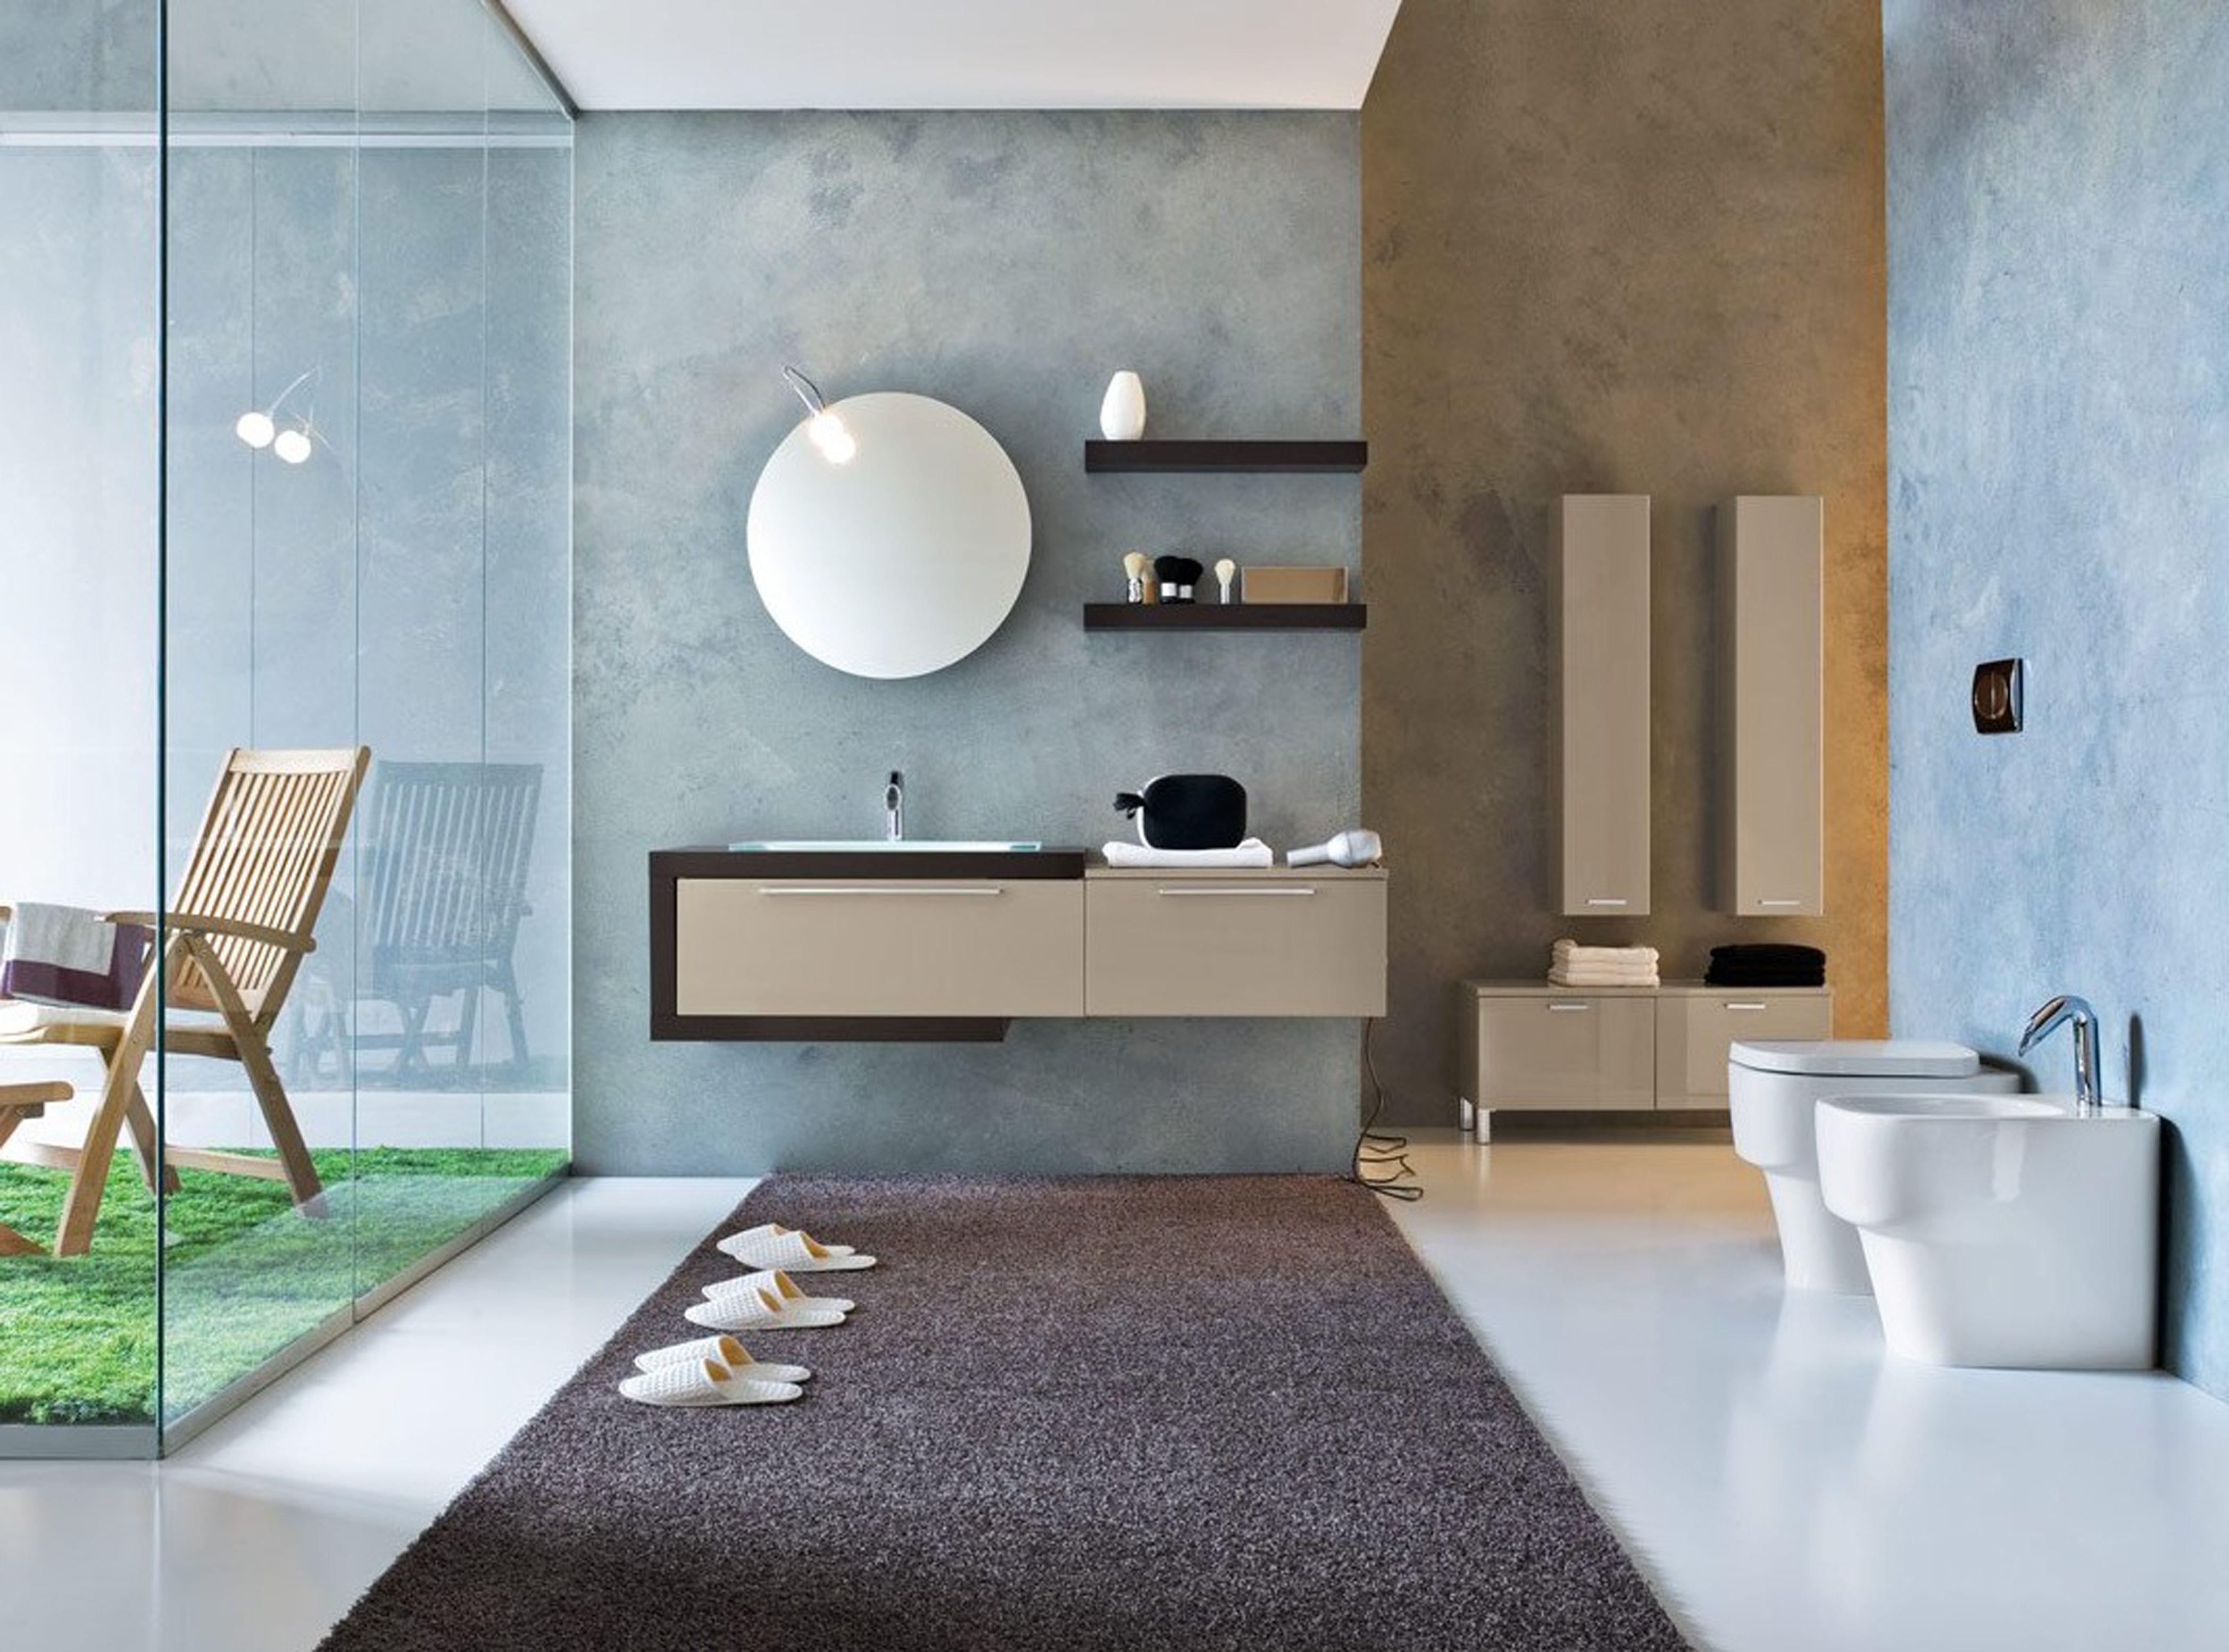 Tiny bathroom design ideas bathroom ideas and designs bathroom floor